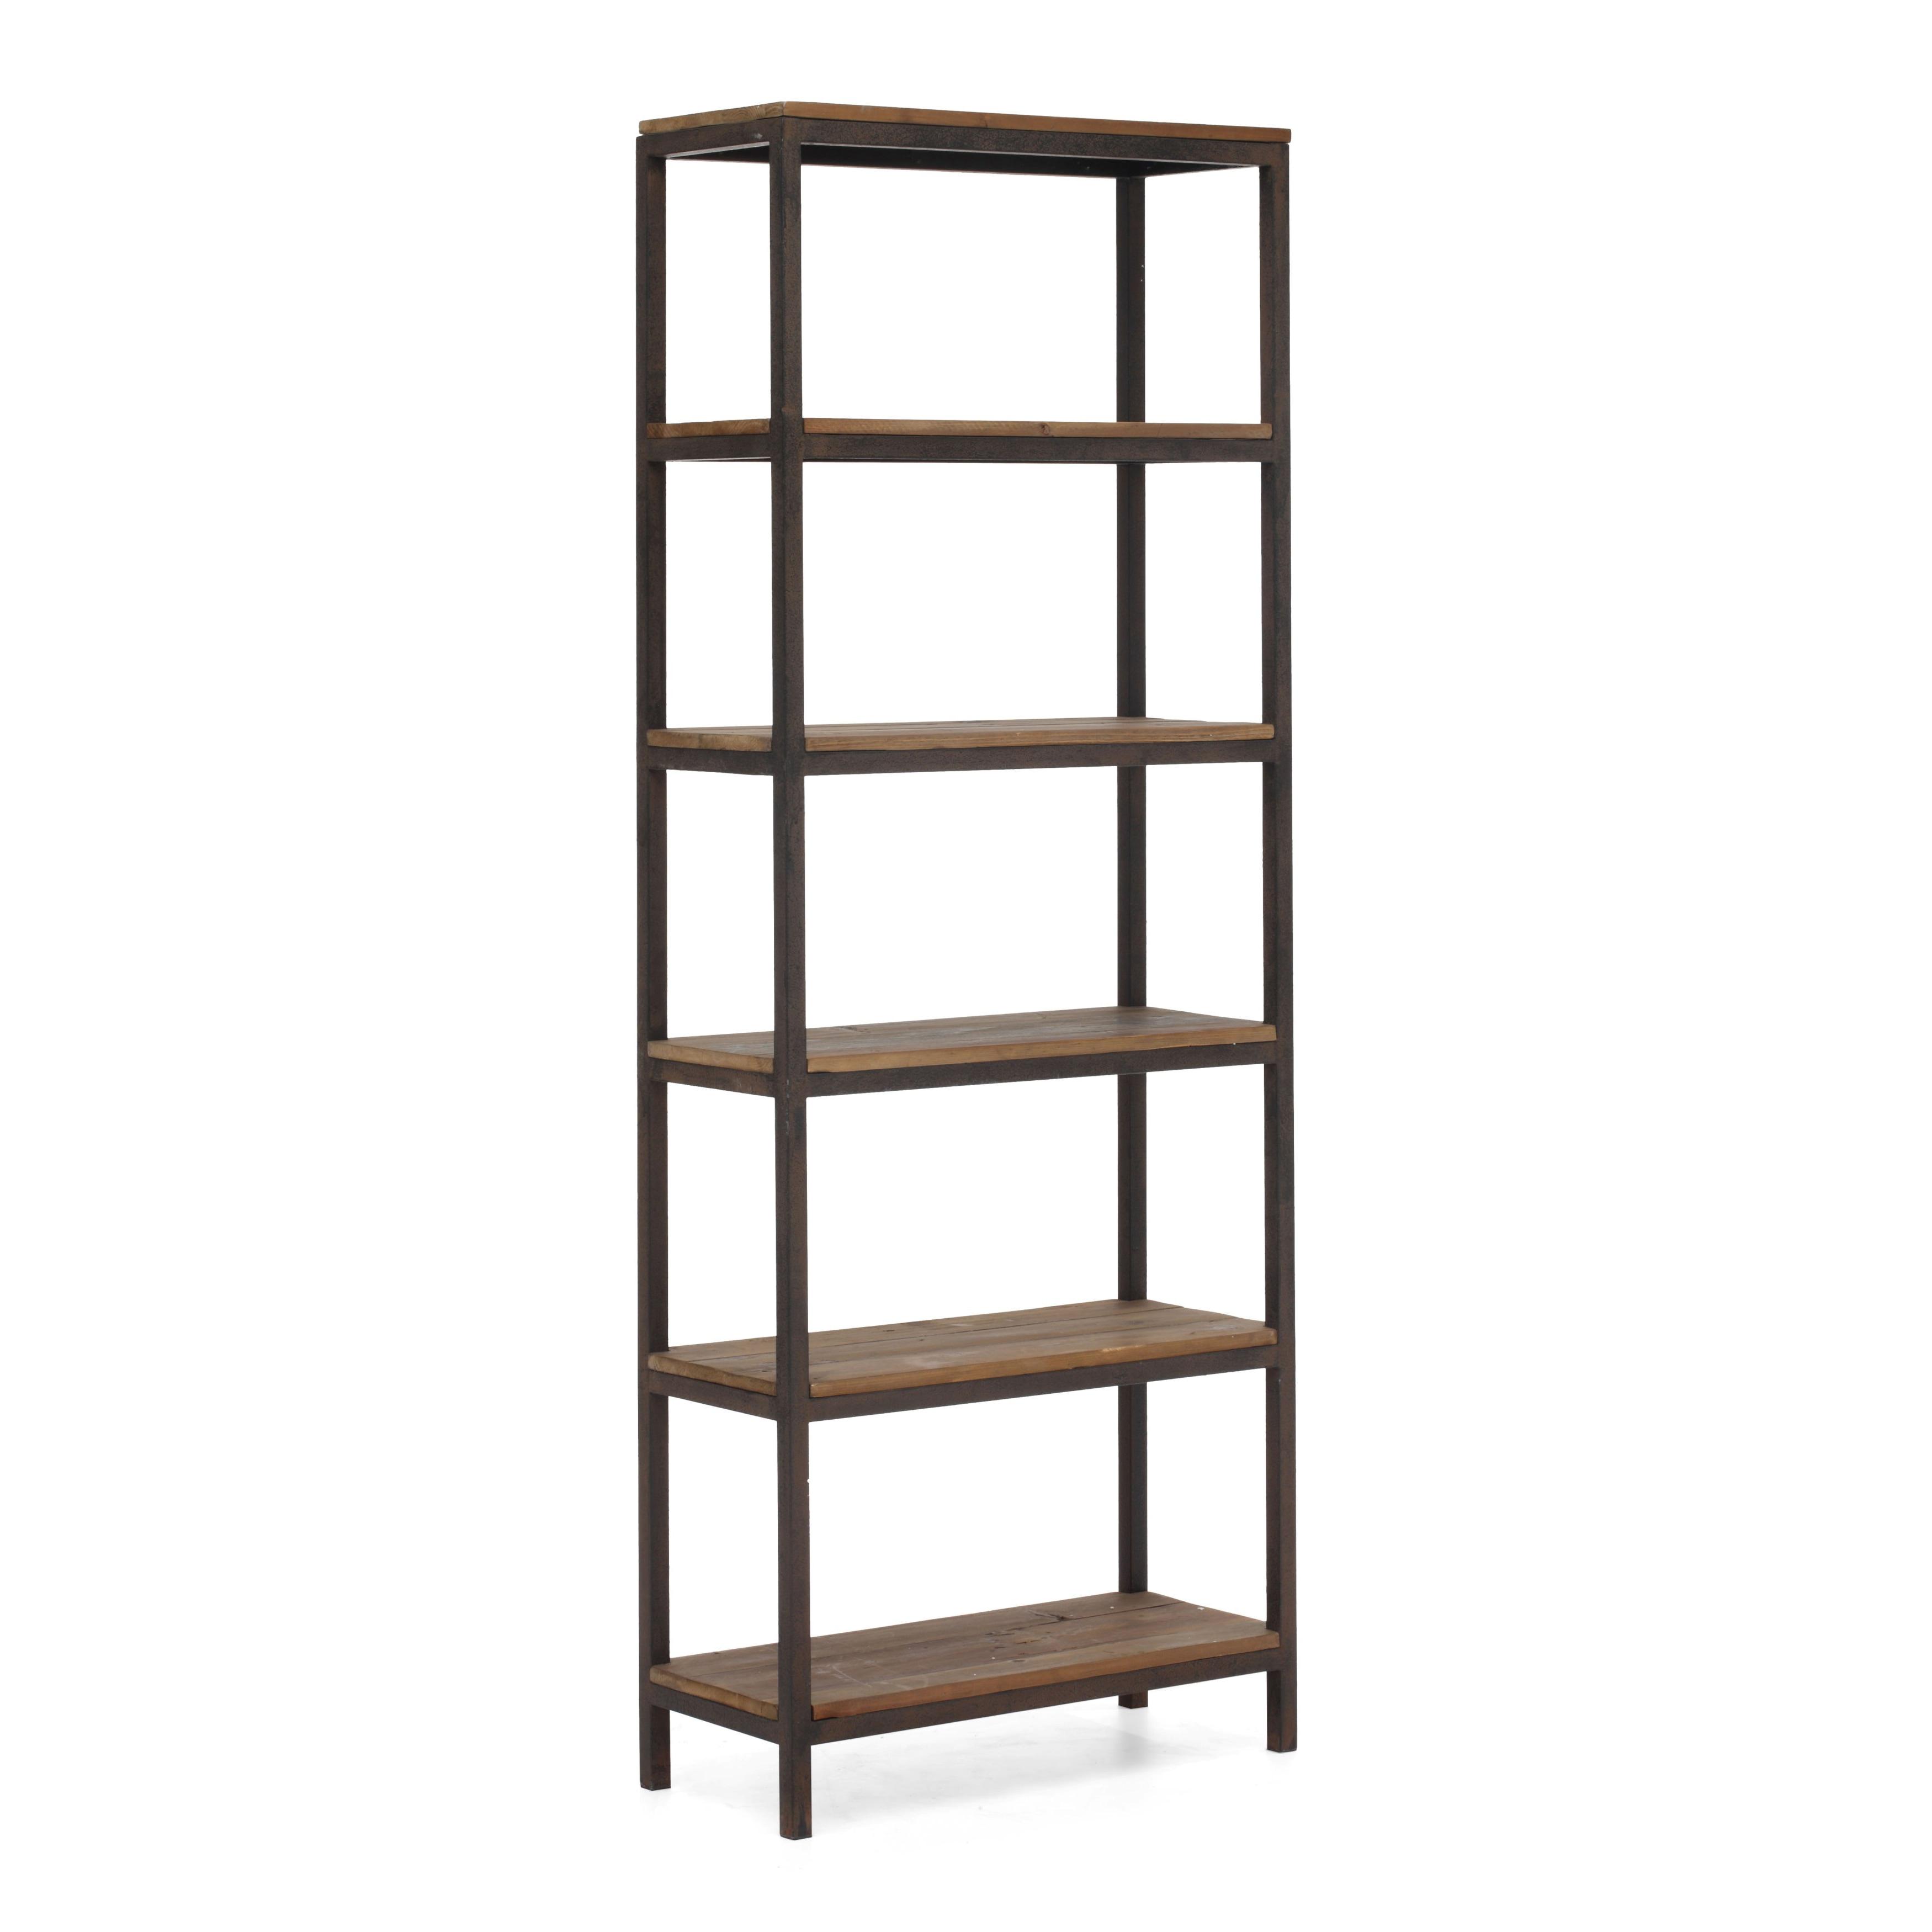 Shop Mission Bay Tall 6 Shelf Distressed Natural Finish Bookshelf